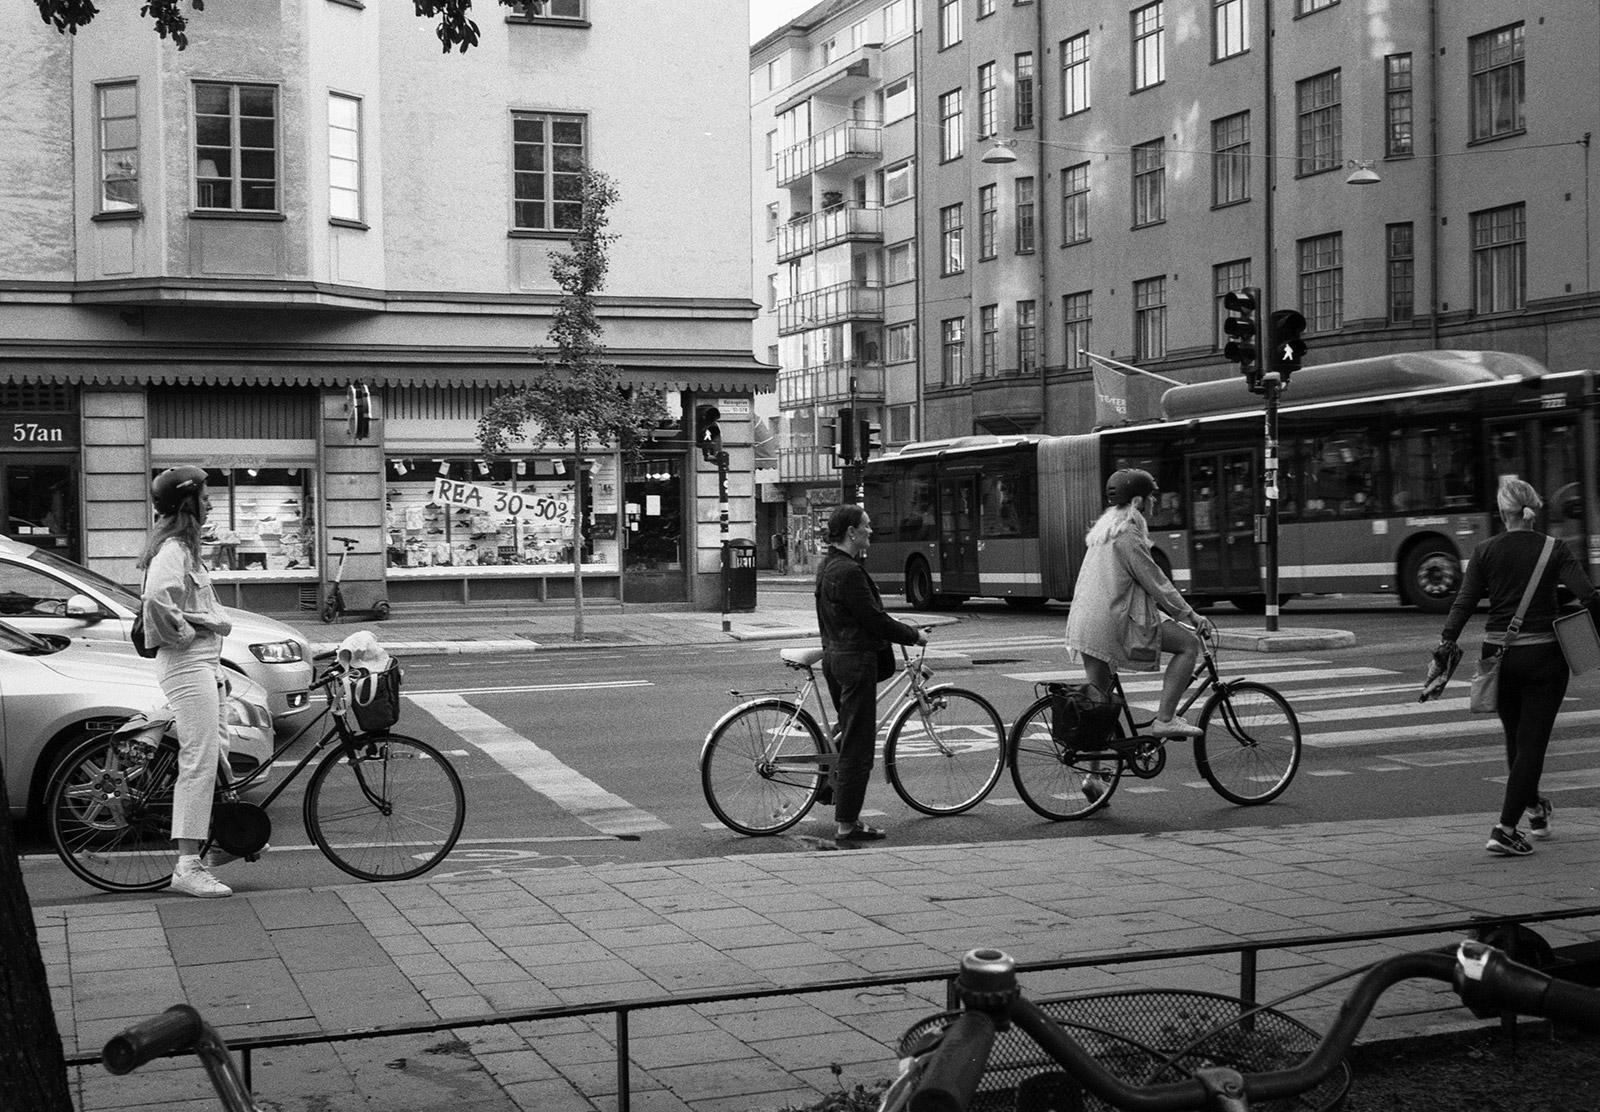 Queueing cyclists